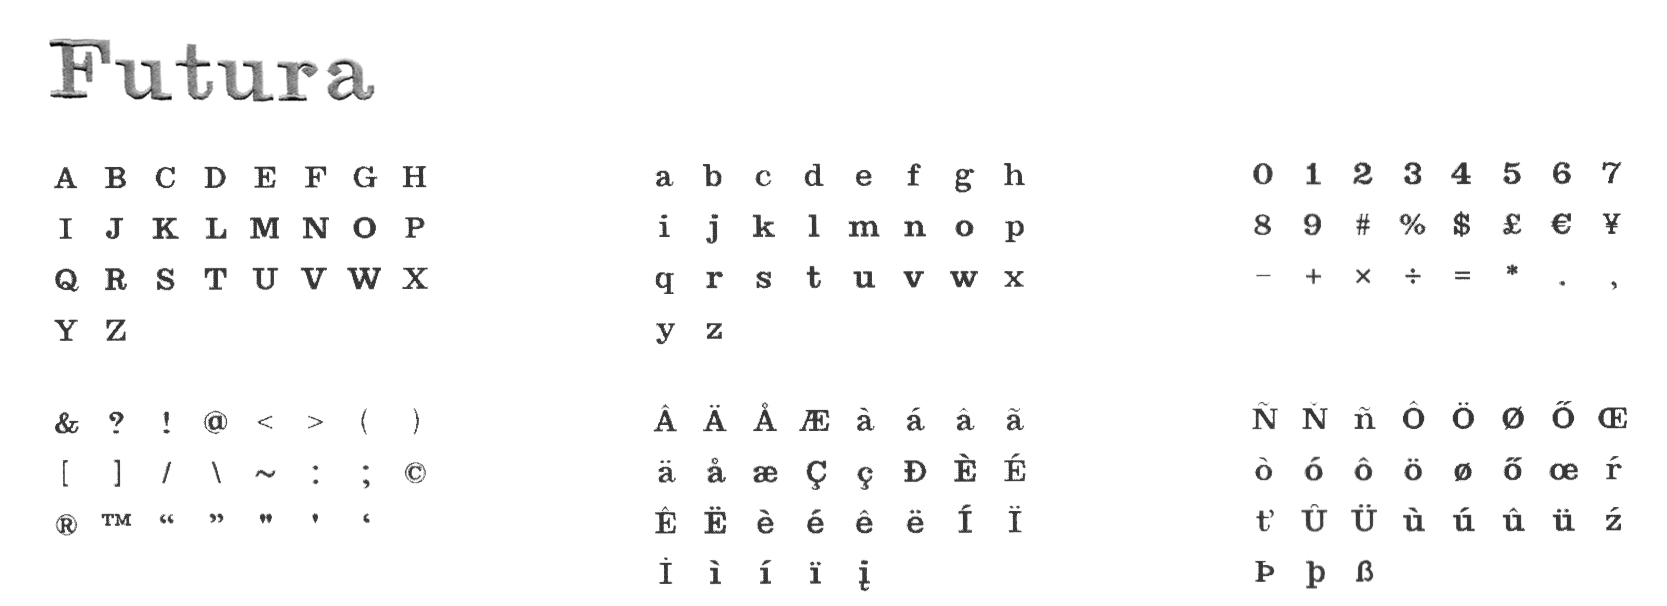 Broderie personnalisée - Typographie Futura